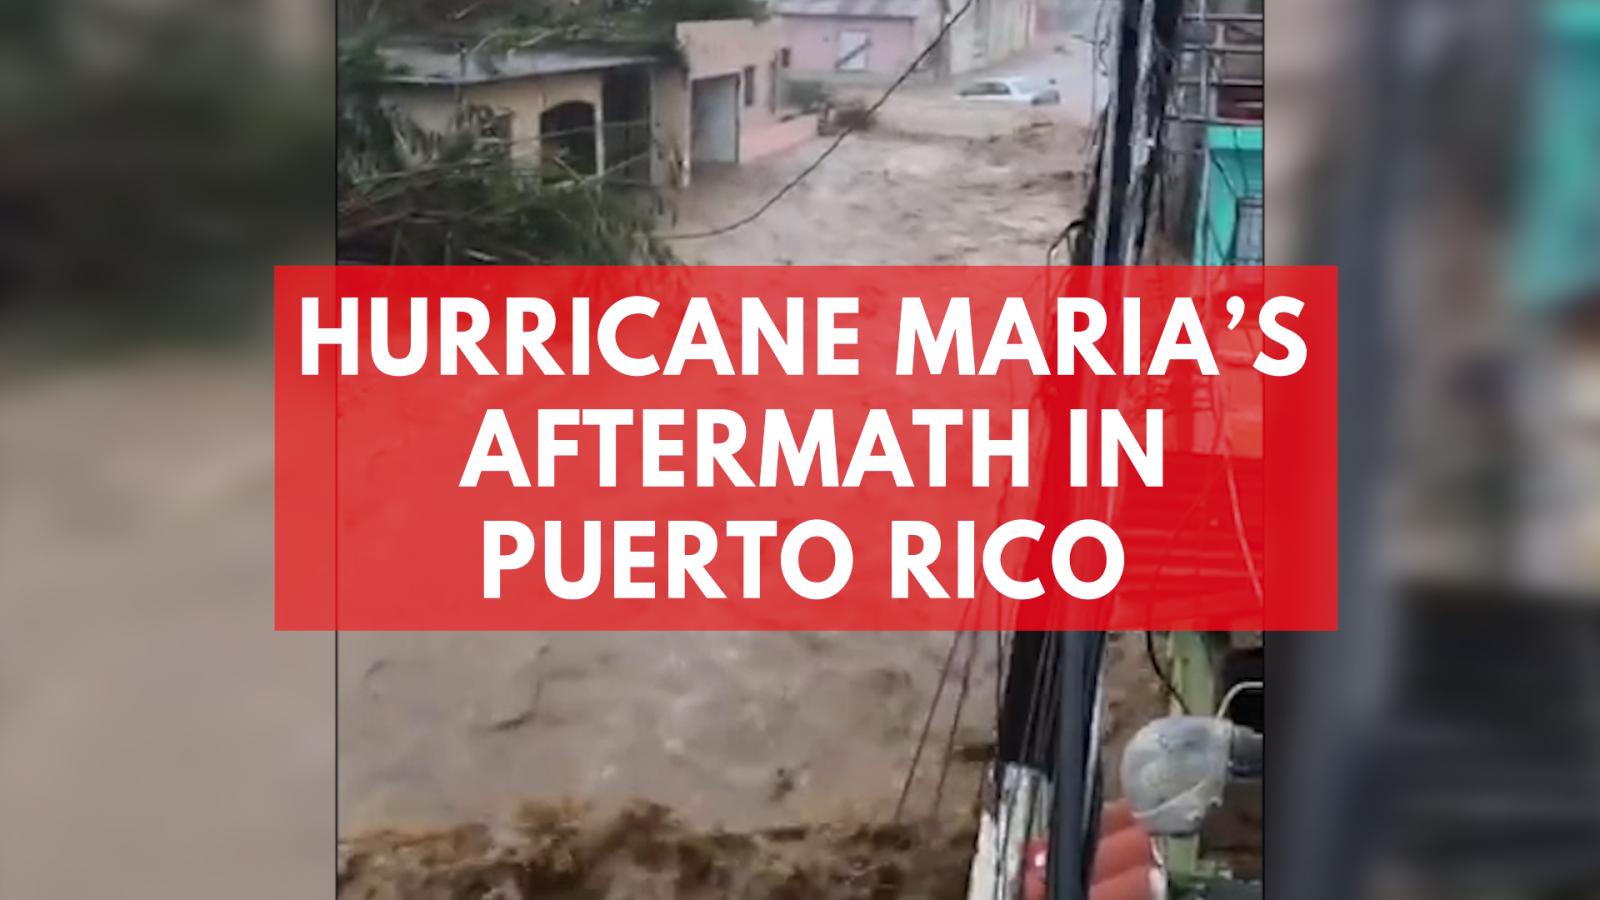 hurricane-marias-aftermath-in-puerto-rico